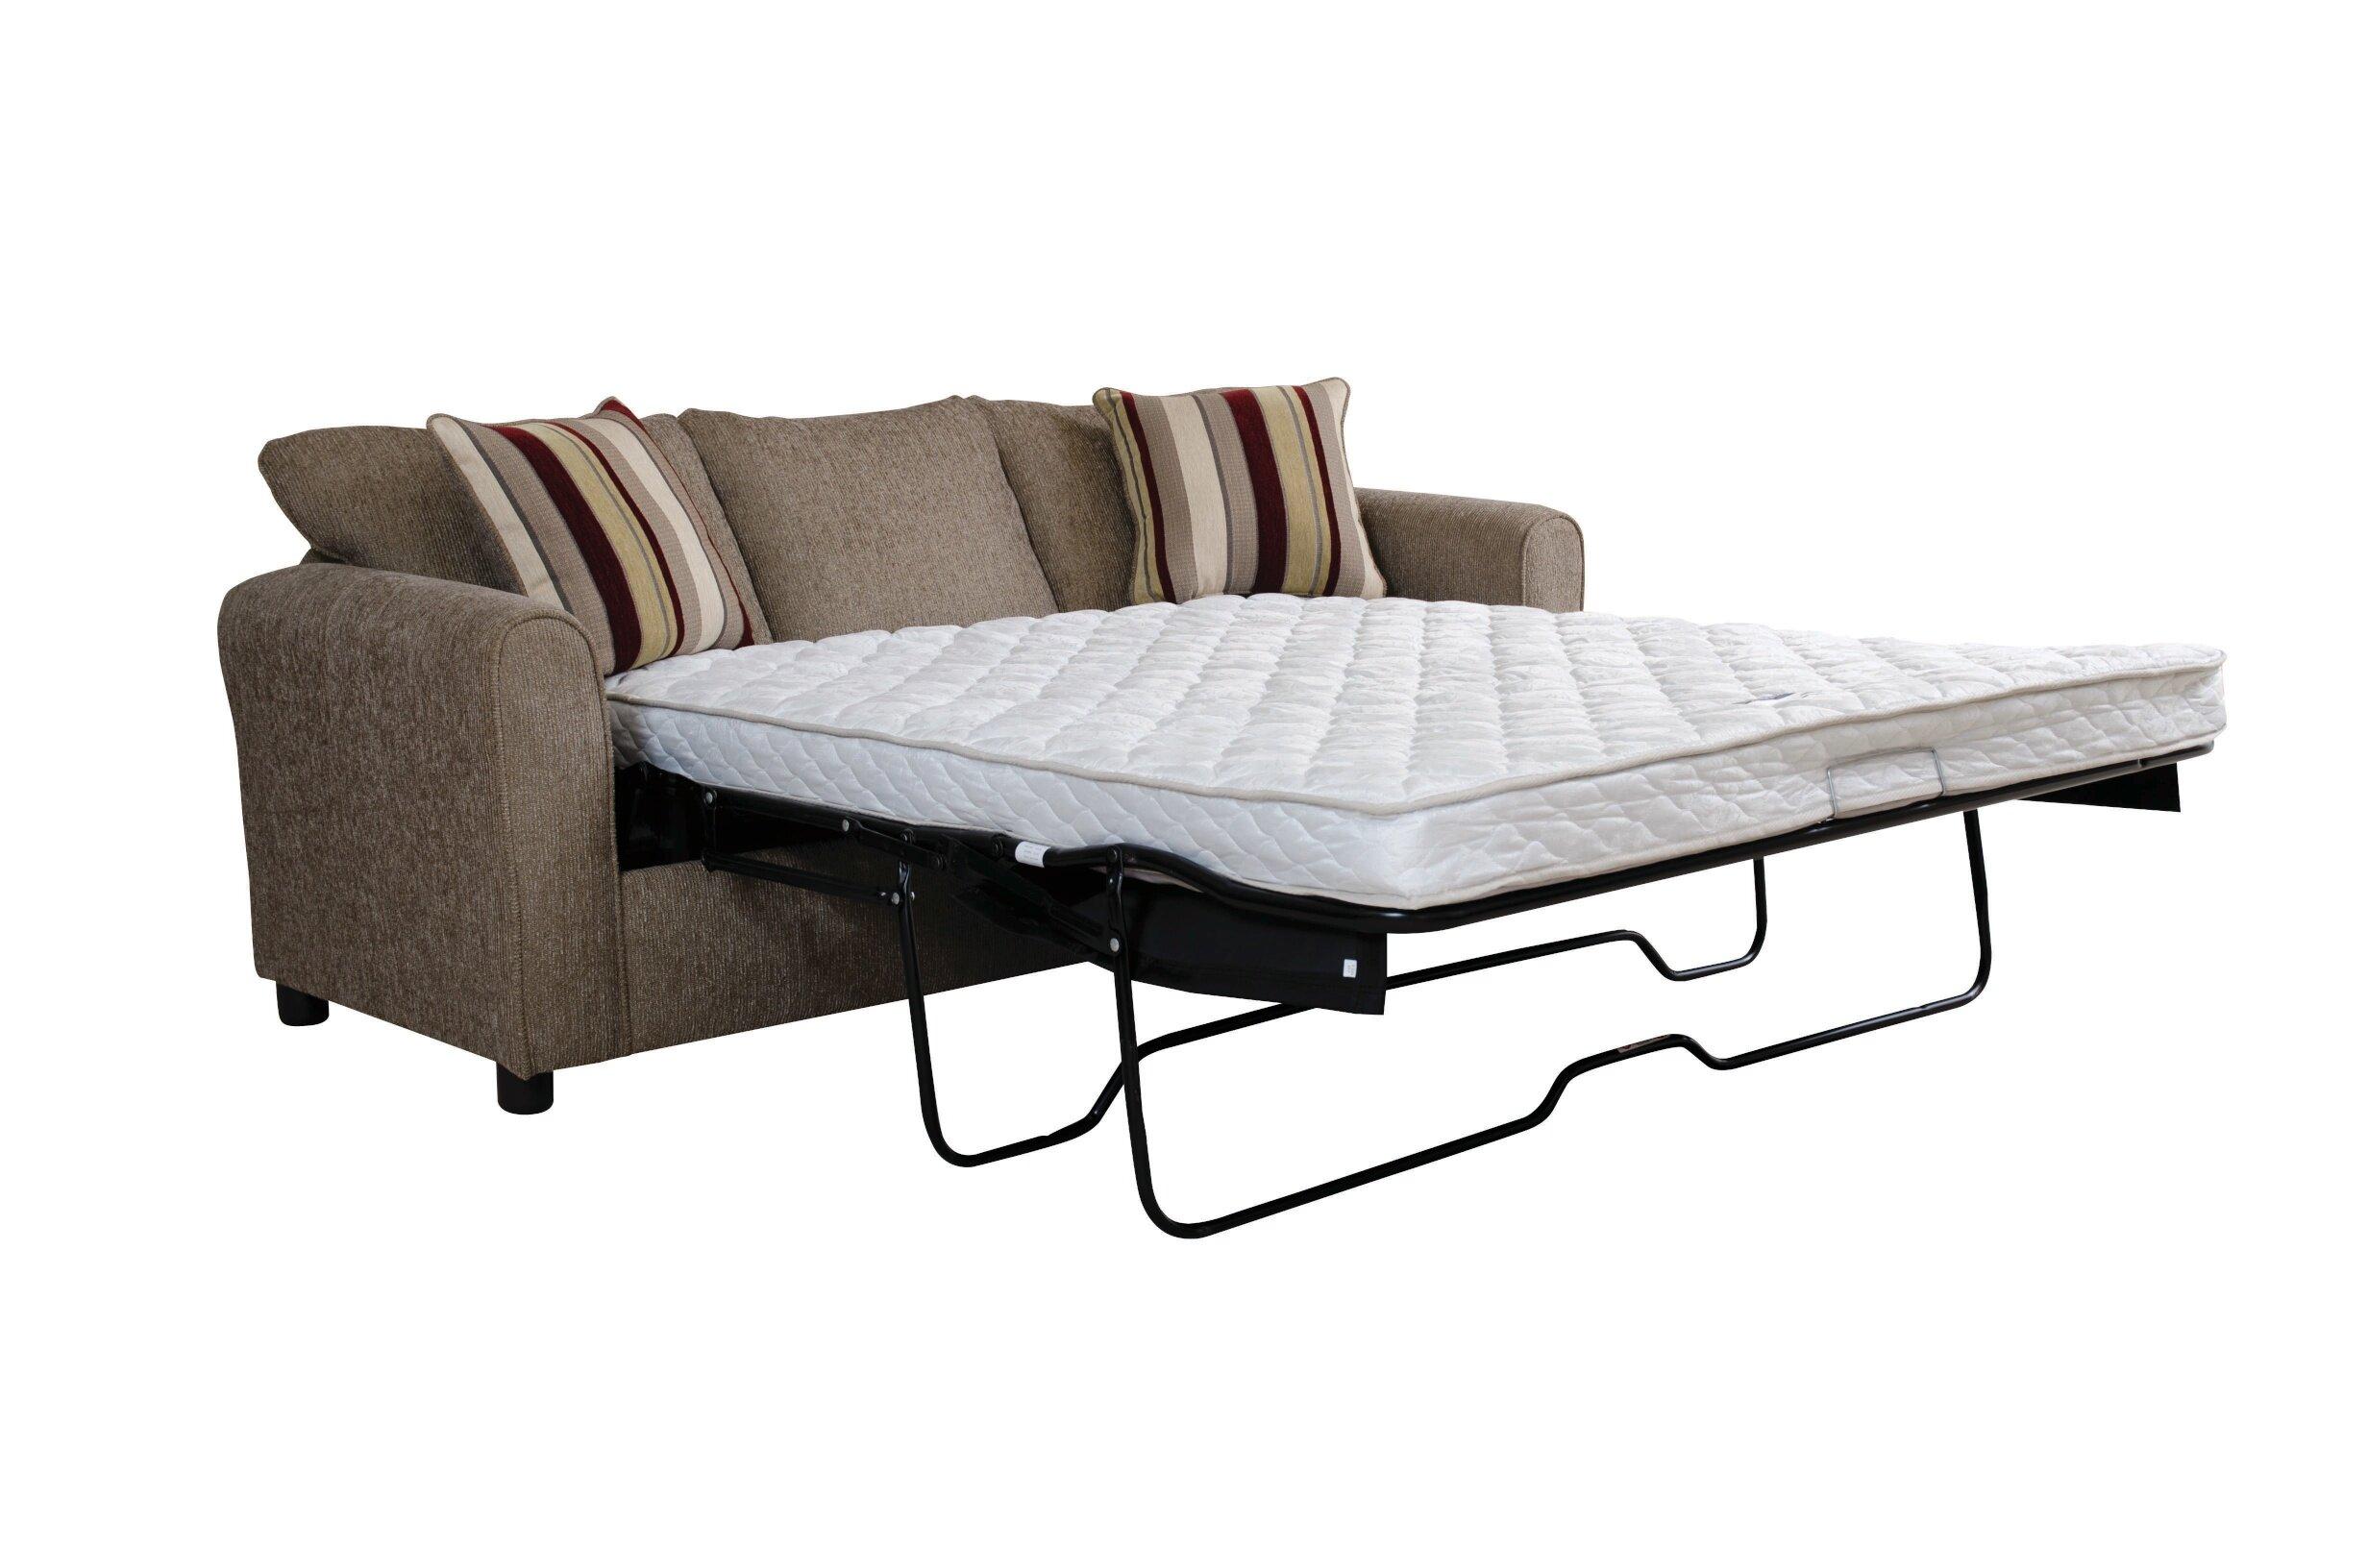 Merveilleux Red Barrel Studio Serta Upholstery Malloy Sleeper Sofa U0026 Reviews   Wayfair